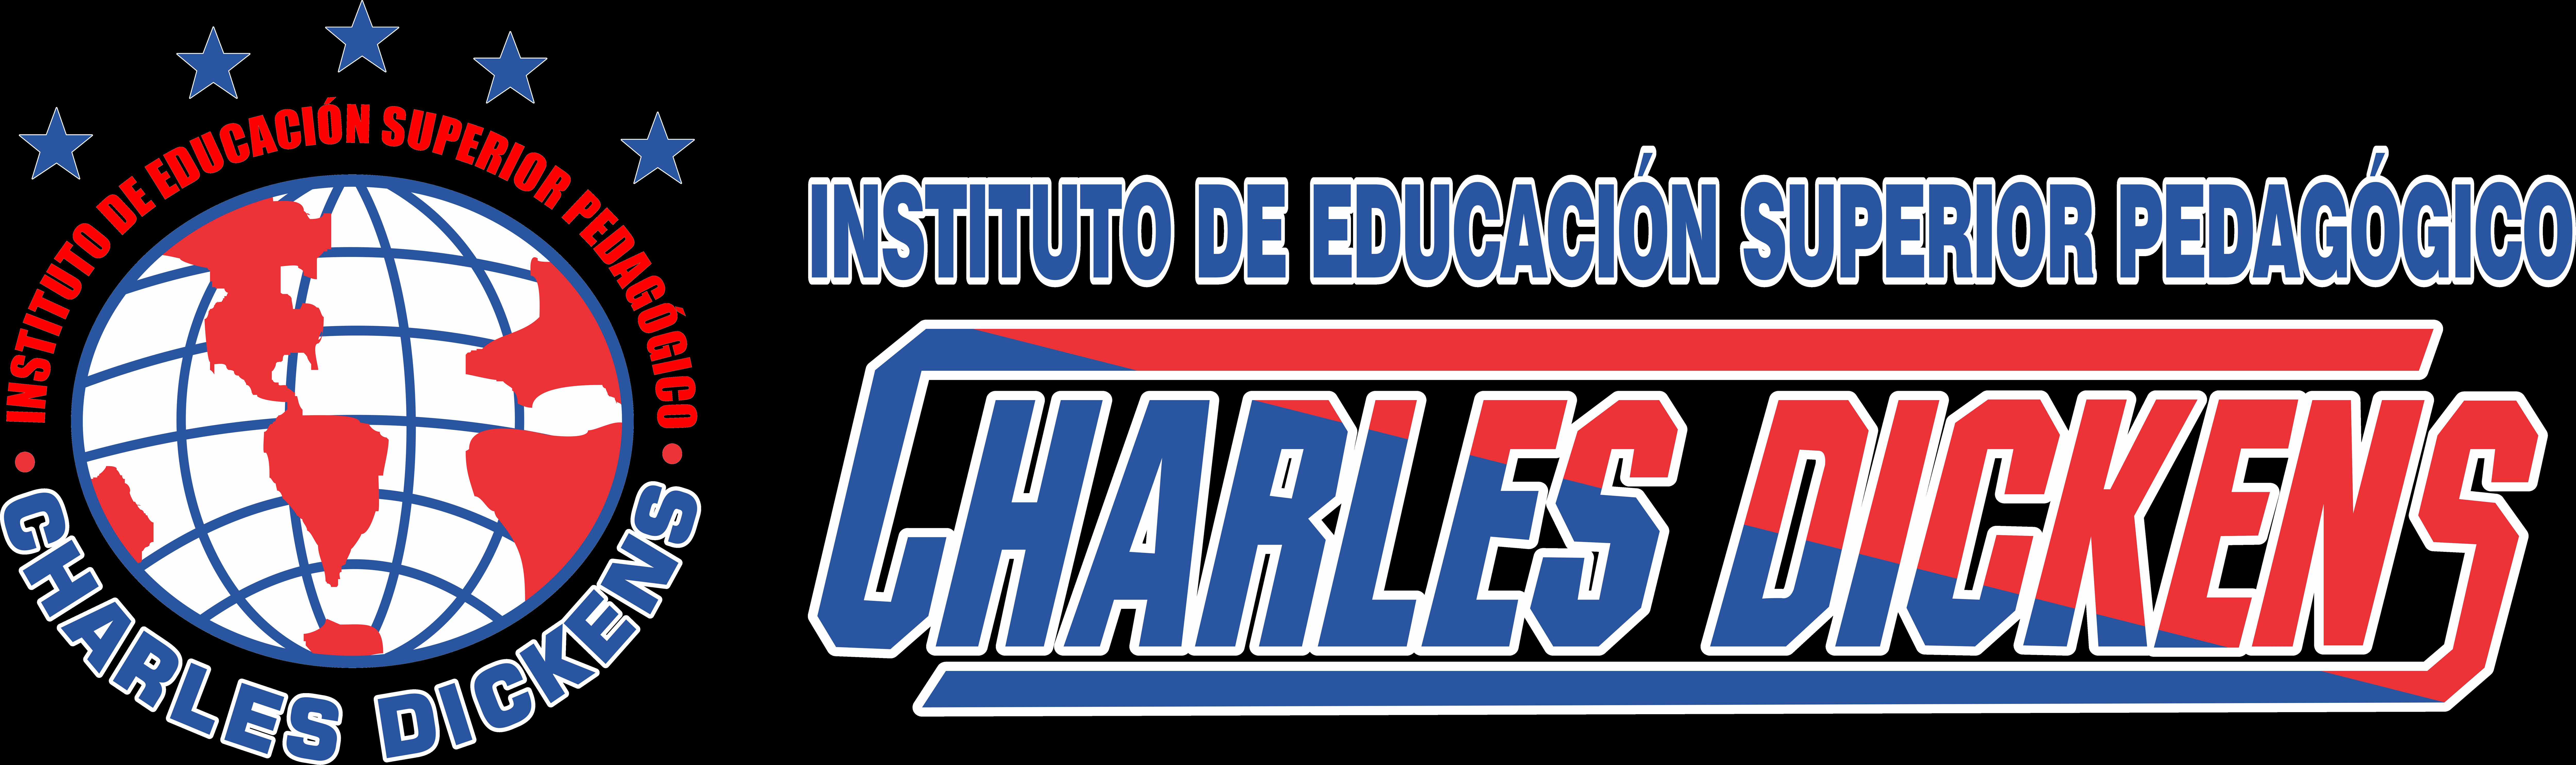 Charles Dickens logo